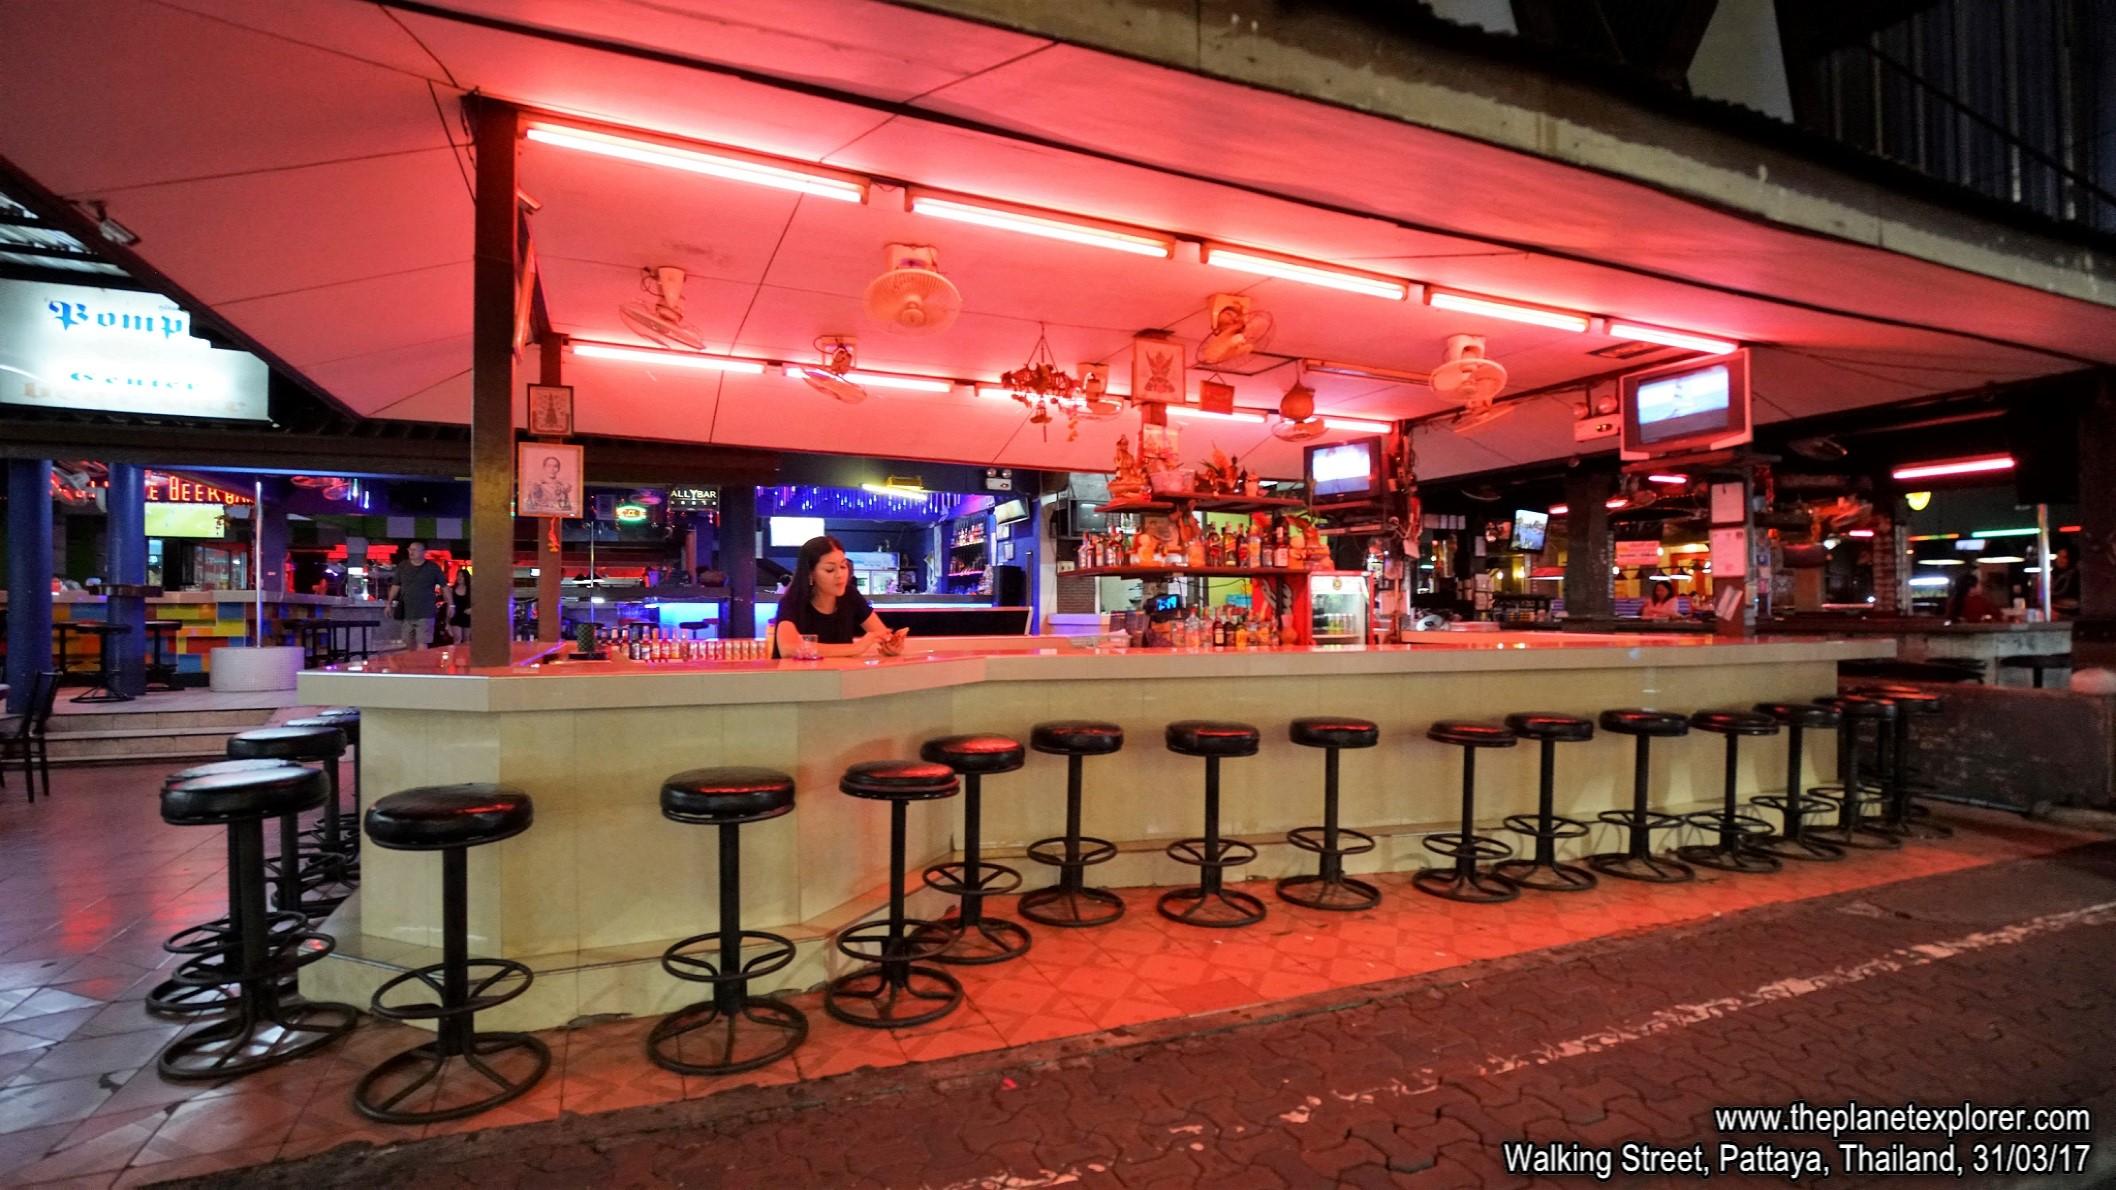 2017-03-31_1949_Thailand_Pattaya_Walking Street_DSC04085_s7R2_LR_@